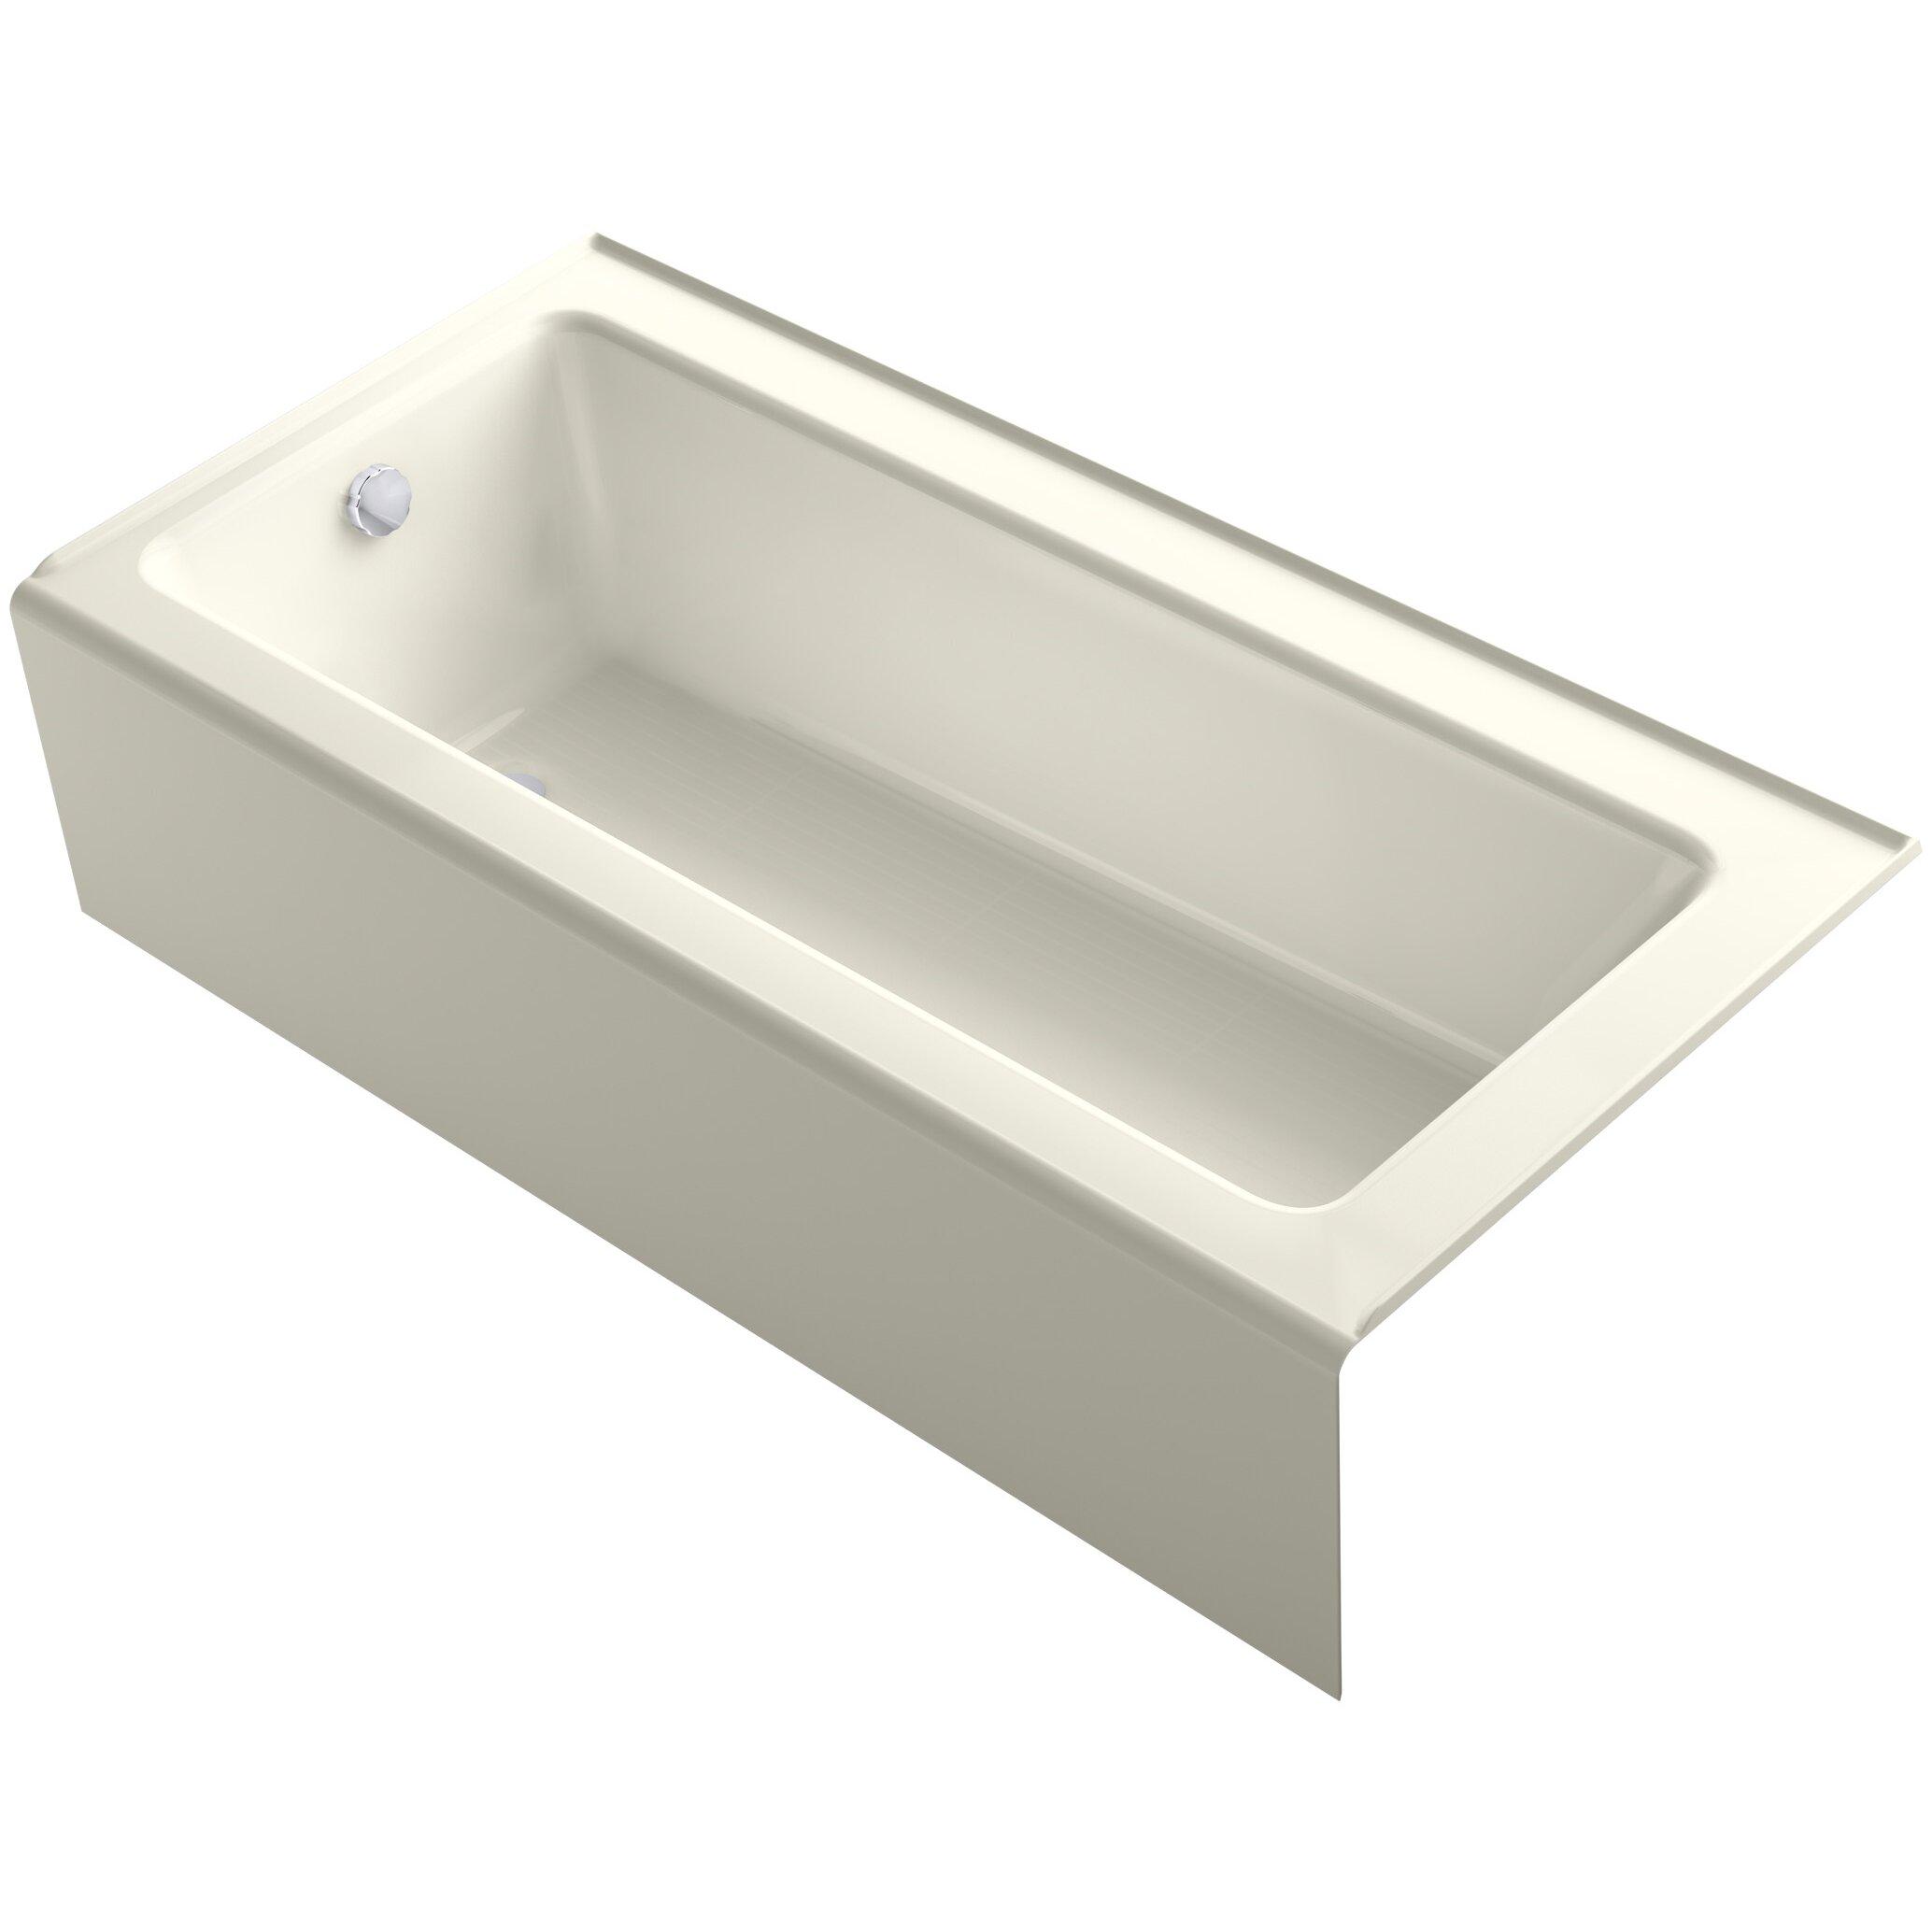 "Bellwether Alcove 66"" X 32"" Soaking Bathtub"